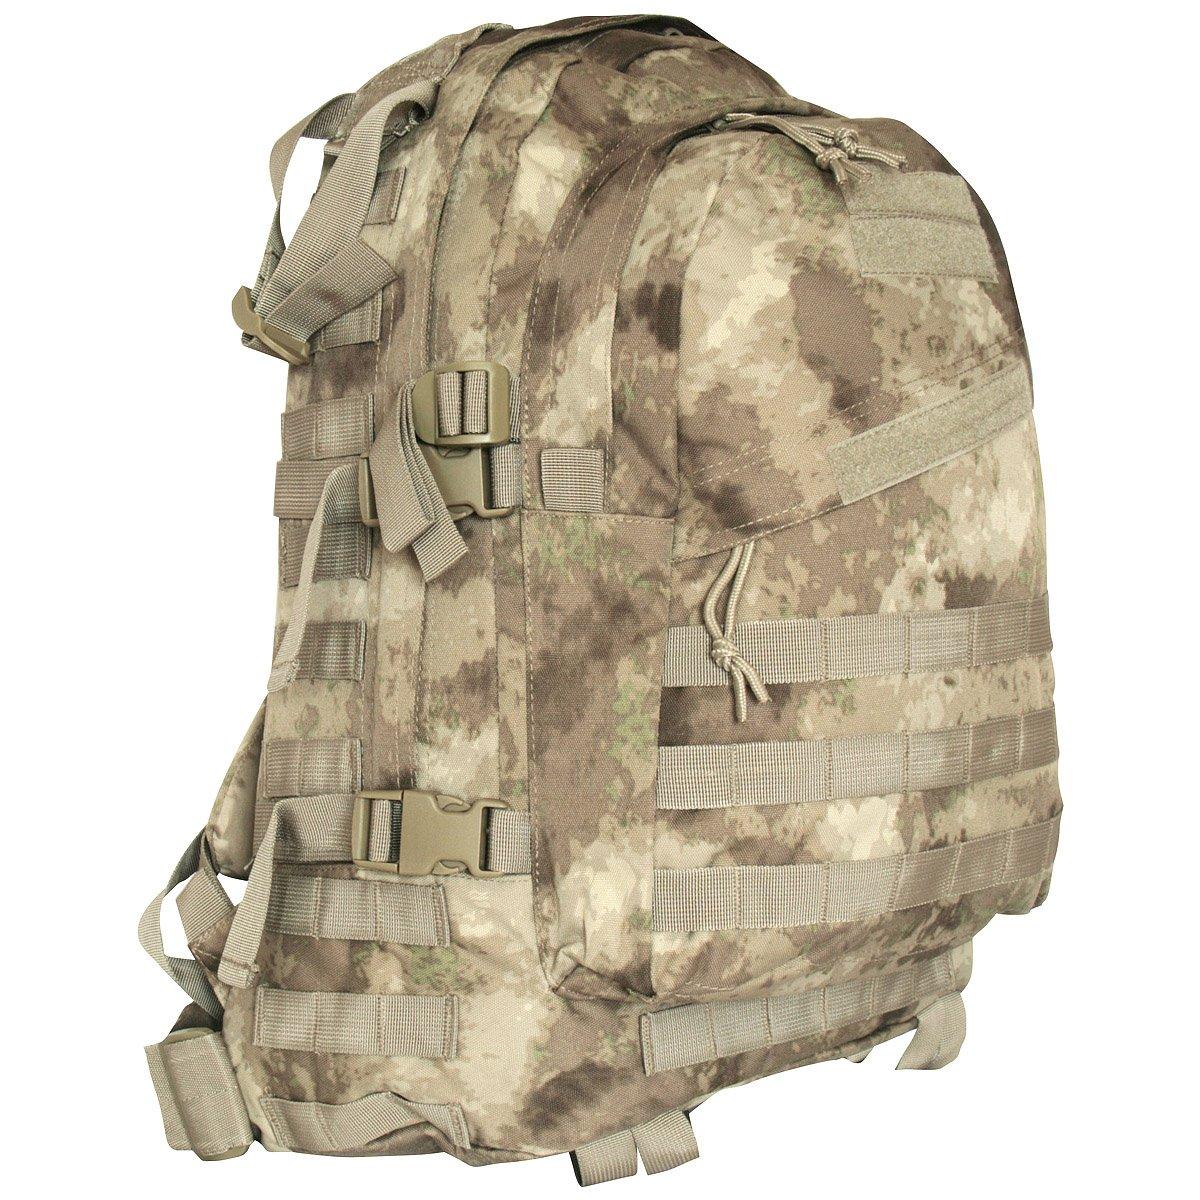 Viper Special Ops Pack A-ttack Grau